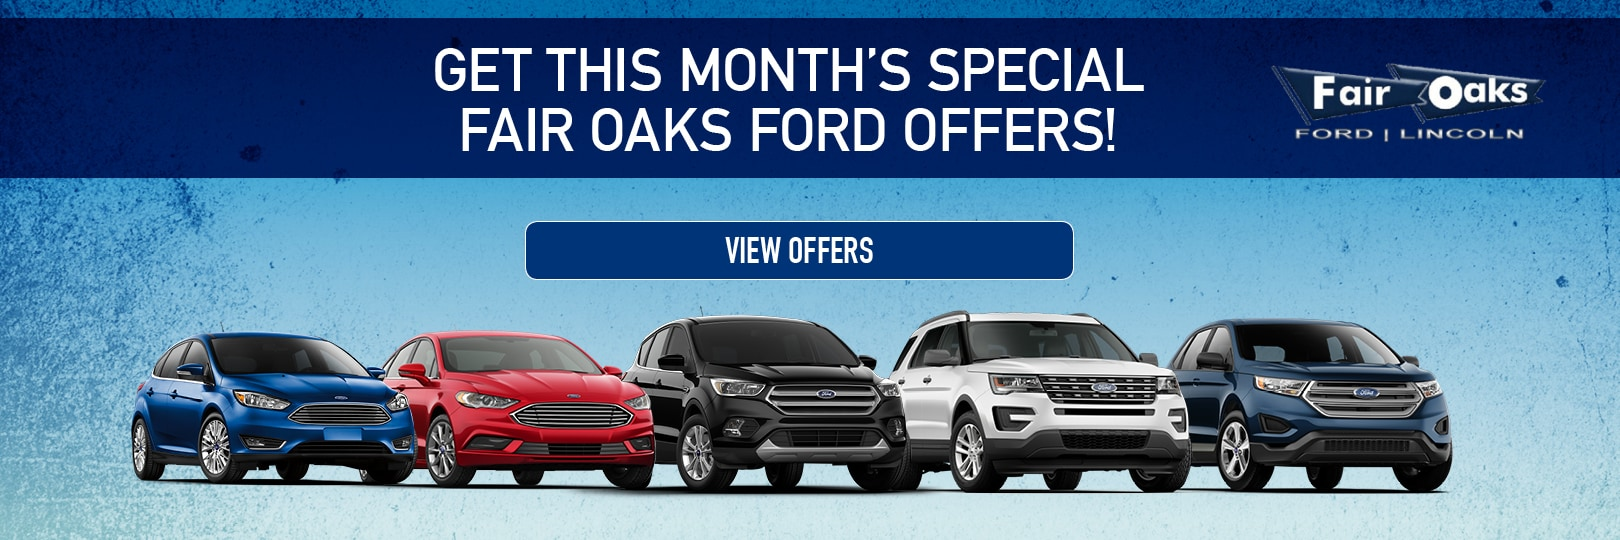 Fair Oaks Ford Lincoln Inc Ford Dealership In Naperville IL - Ford dealership naperville